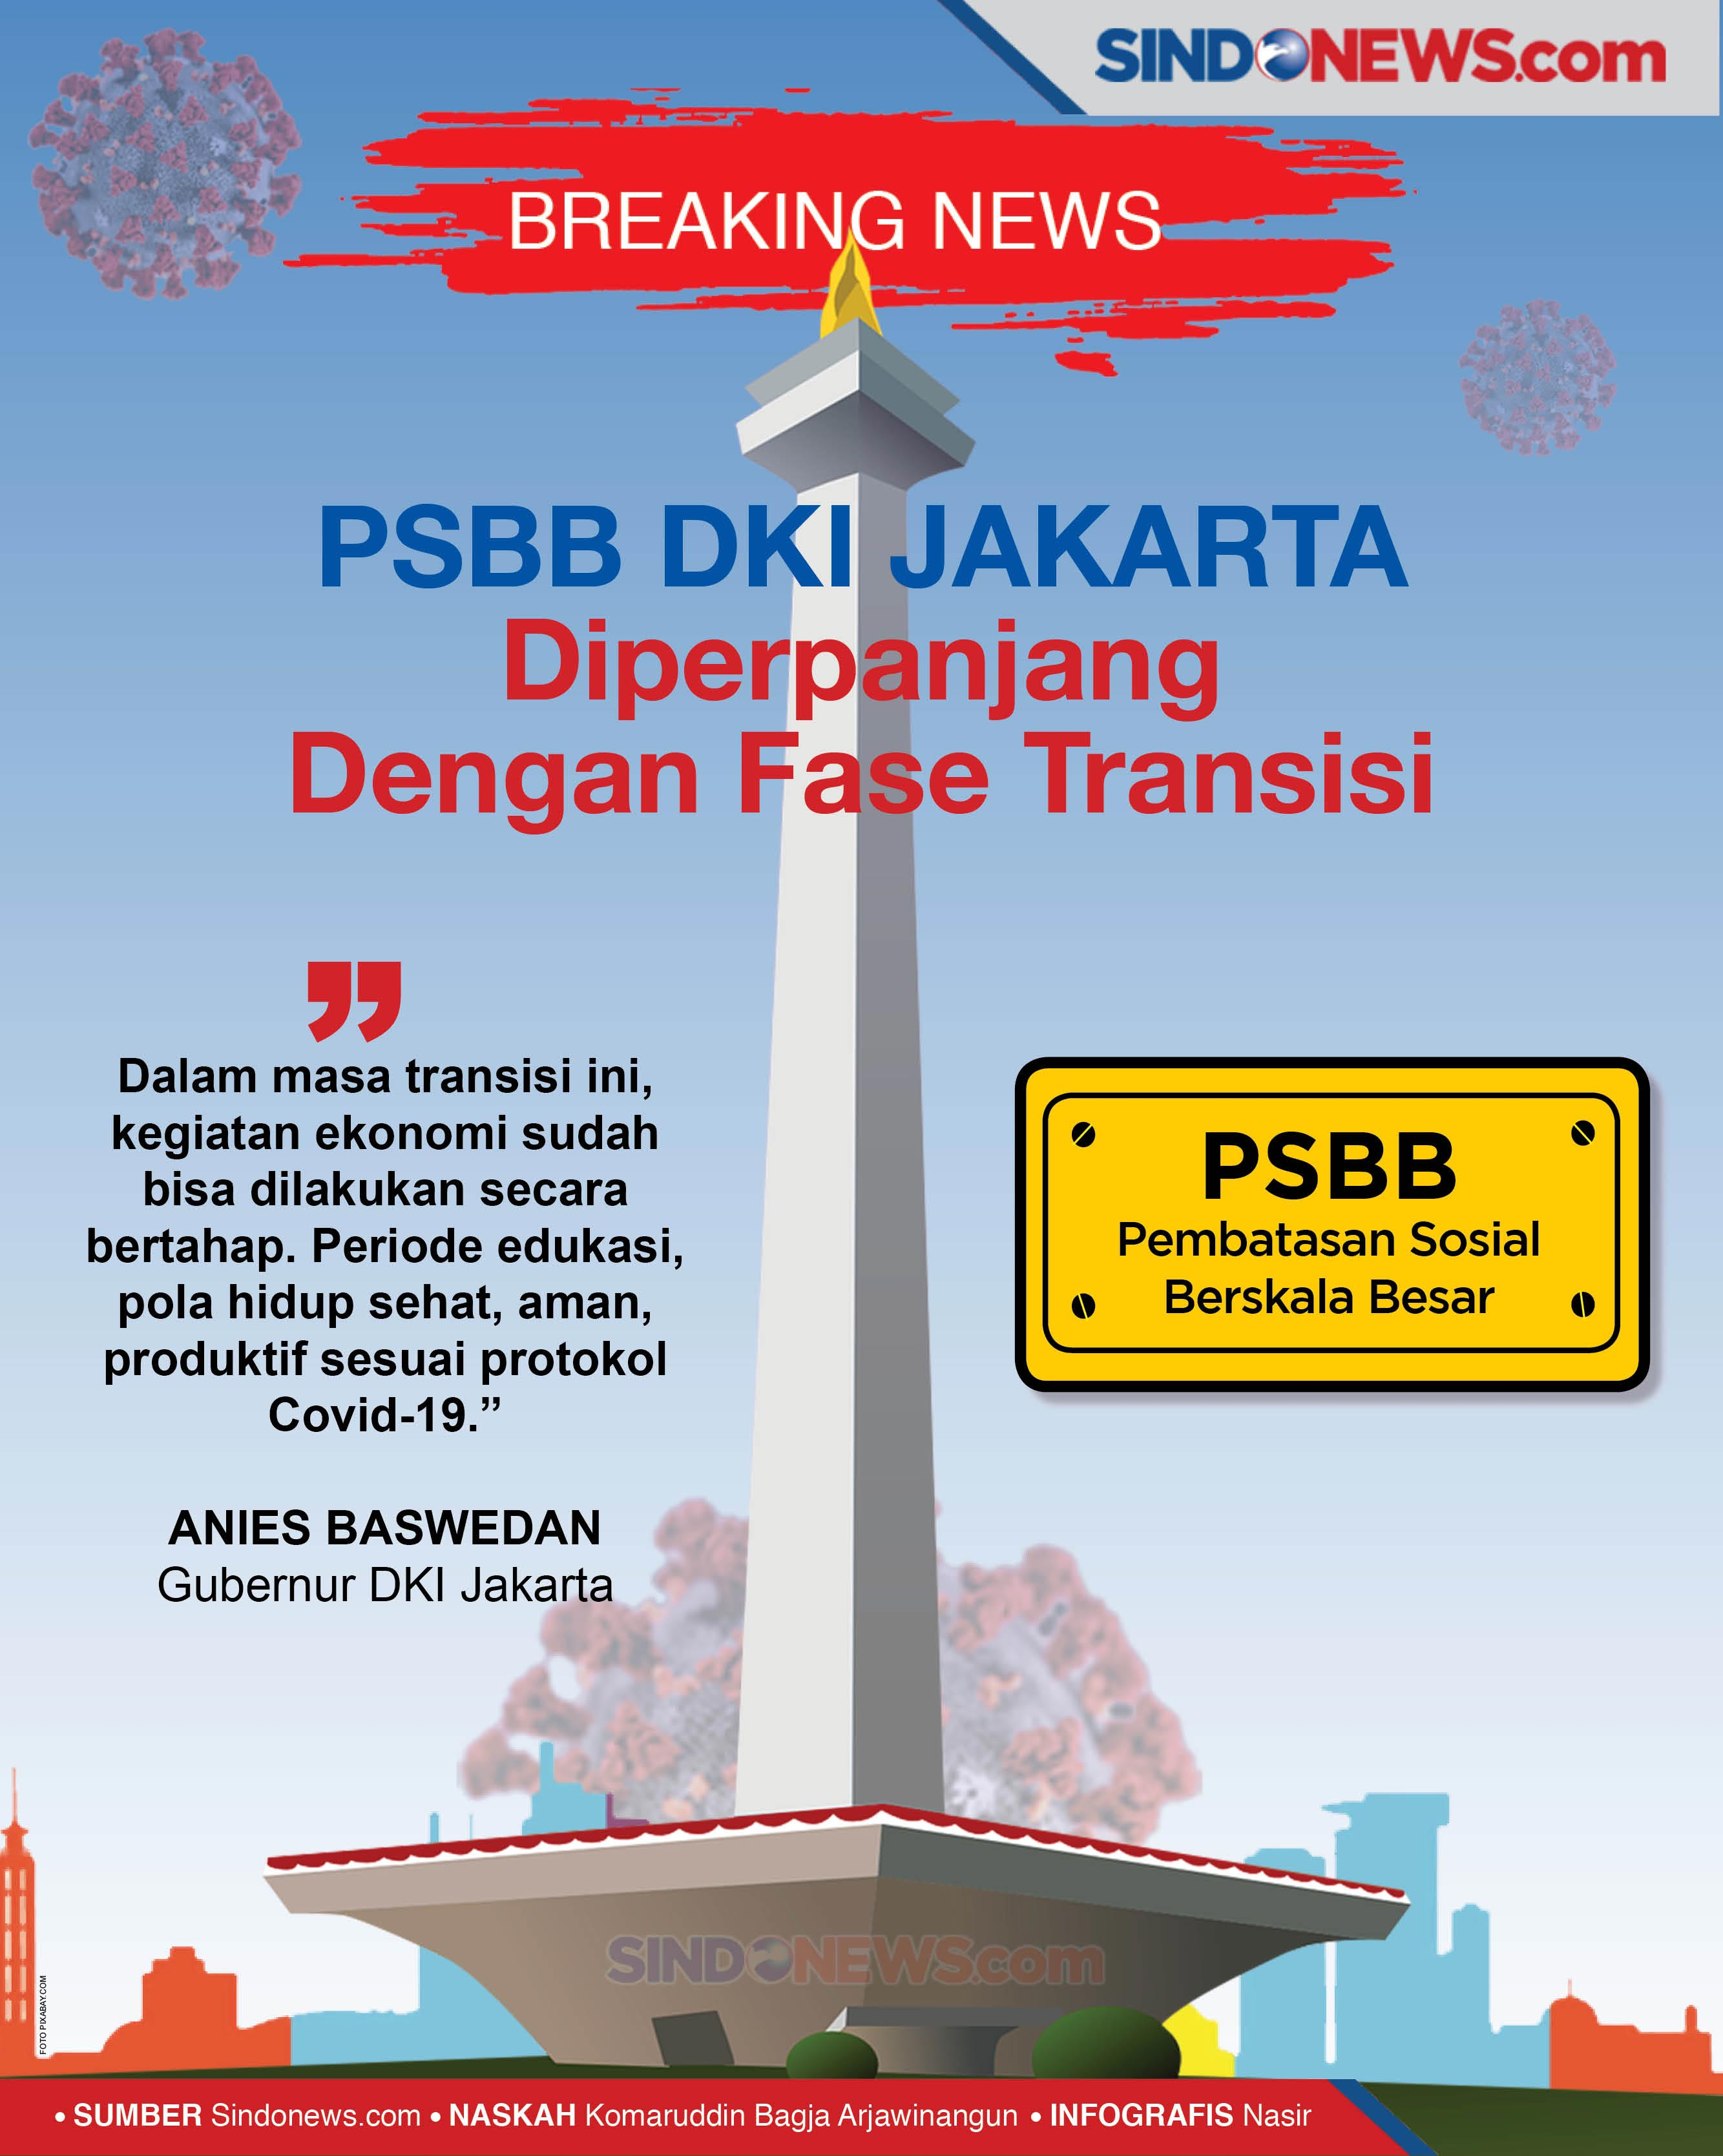 Breaking Psbb Dki Jakarta Diperpanjang Dengan Fase Transisi